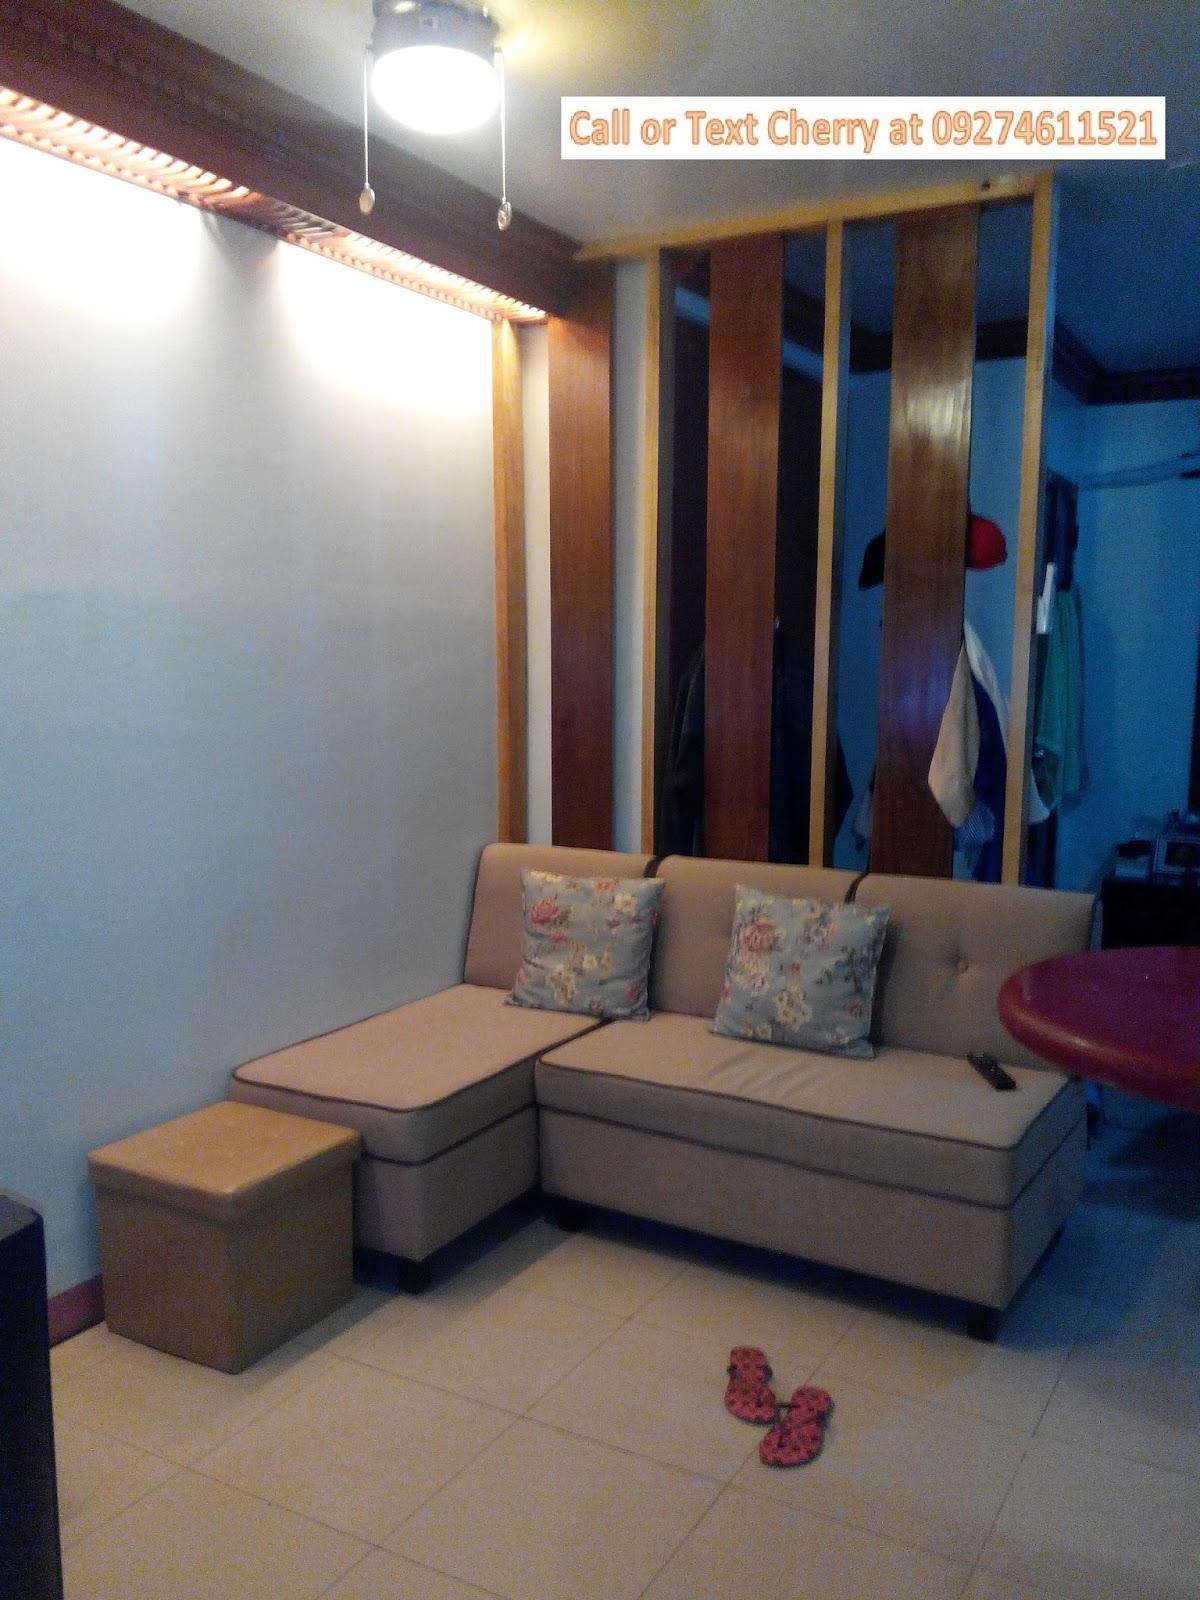 Real Estate In Cebu Code Asm0001 For Assumption Of Mortgage Urban Deca Homes Condo Tipolo Mandaue